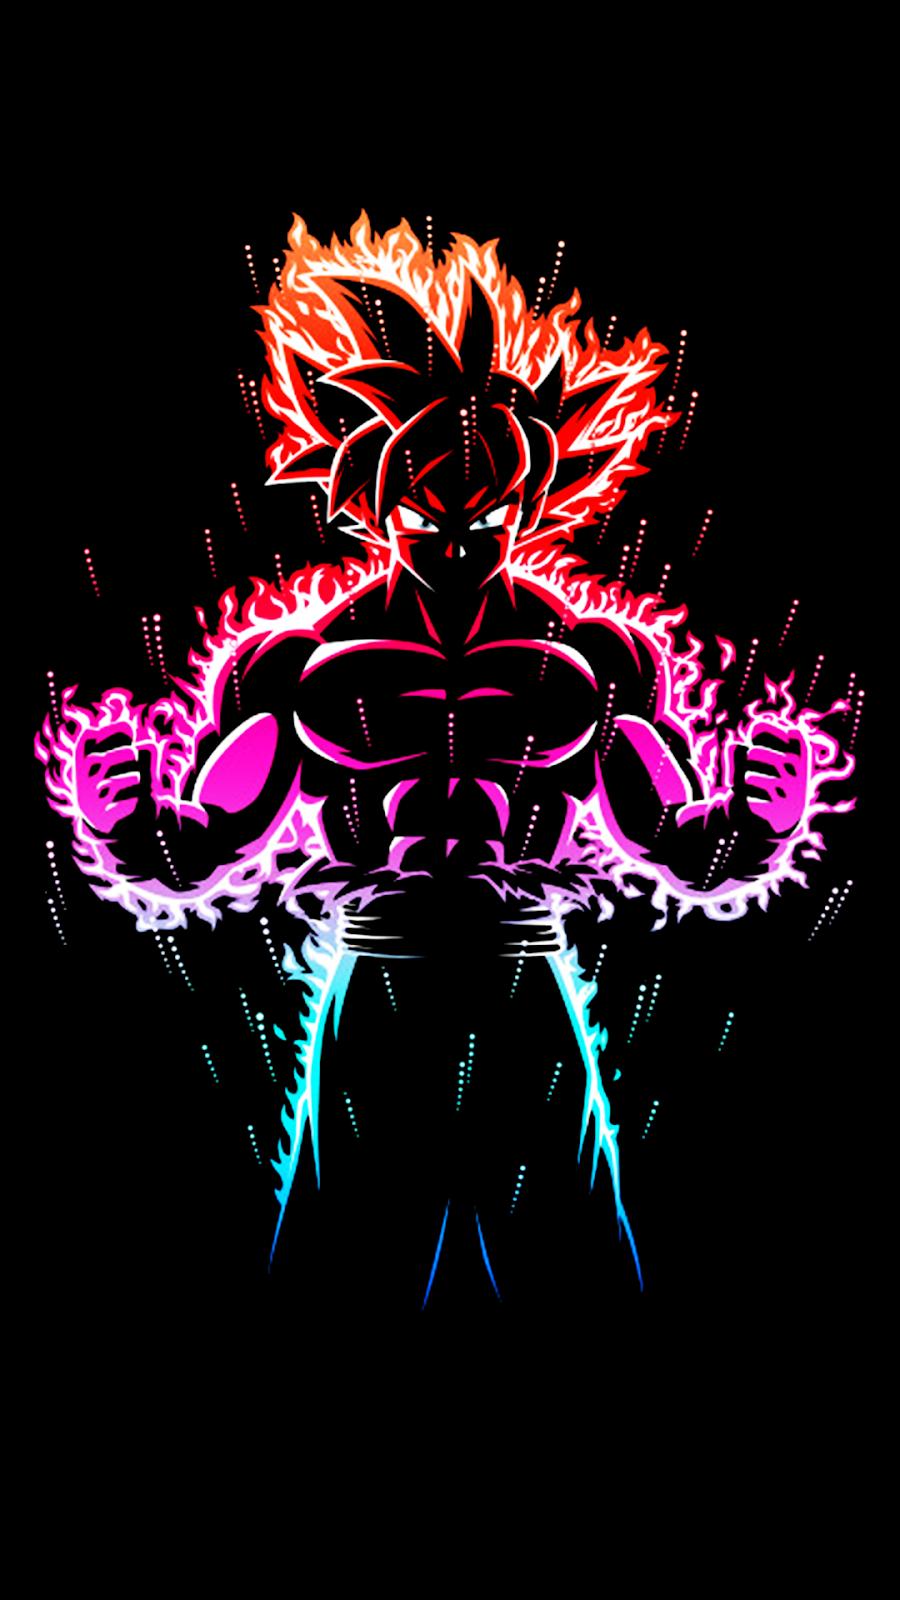 Dragonball Goku Symbol Wallpaper - doraemon